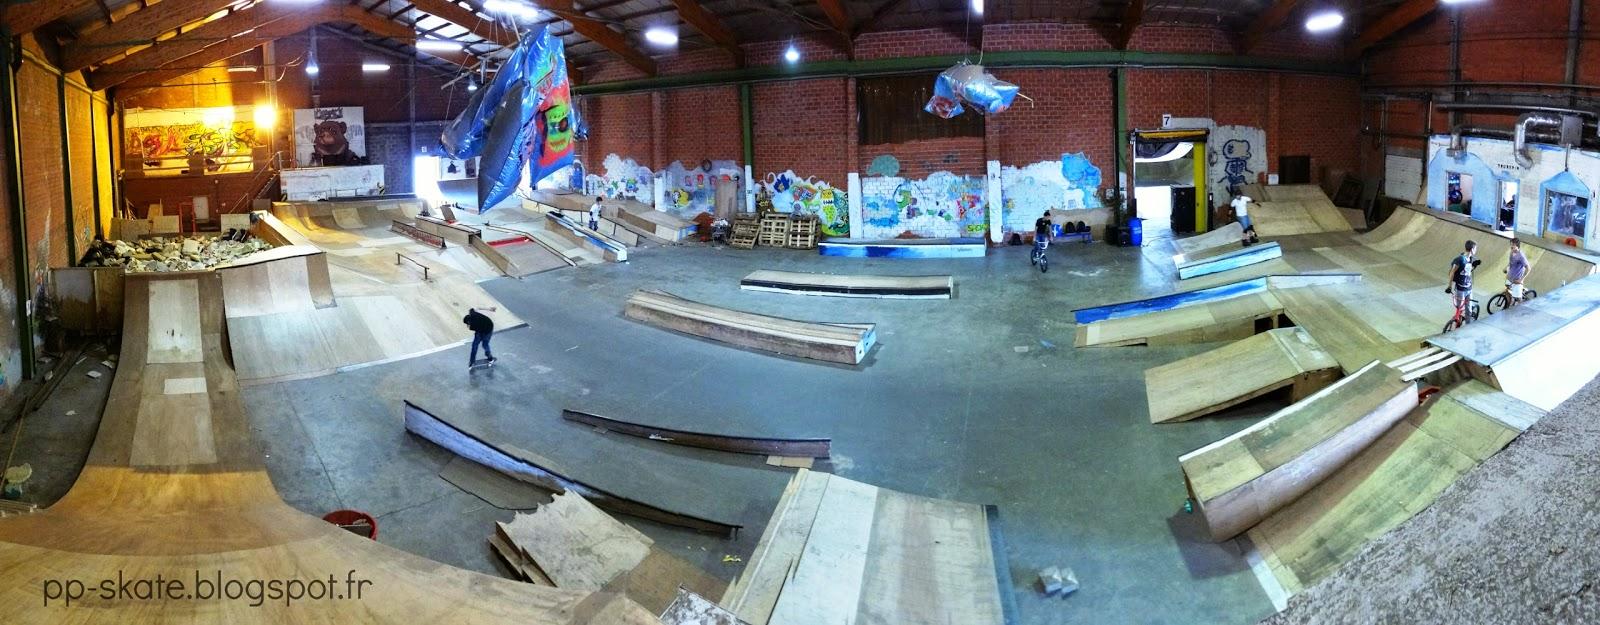 skatepark couvert truespin belgique